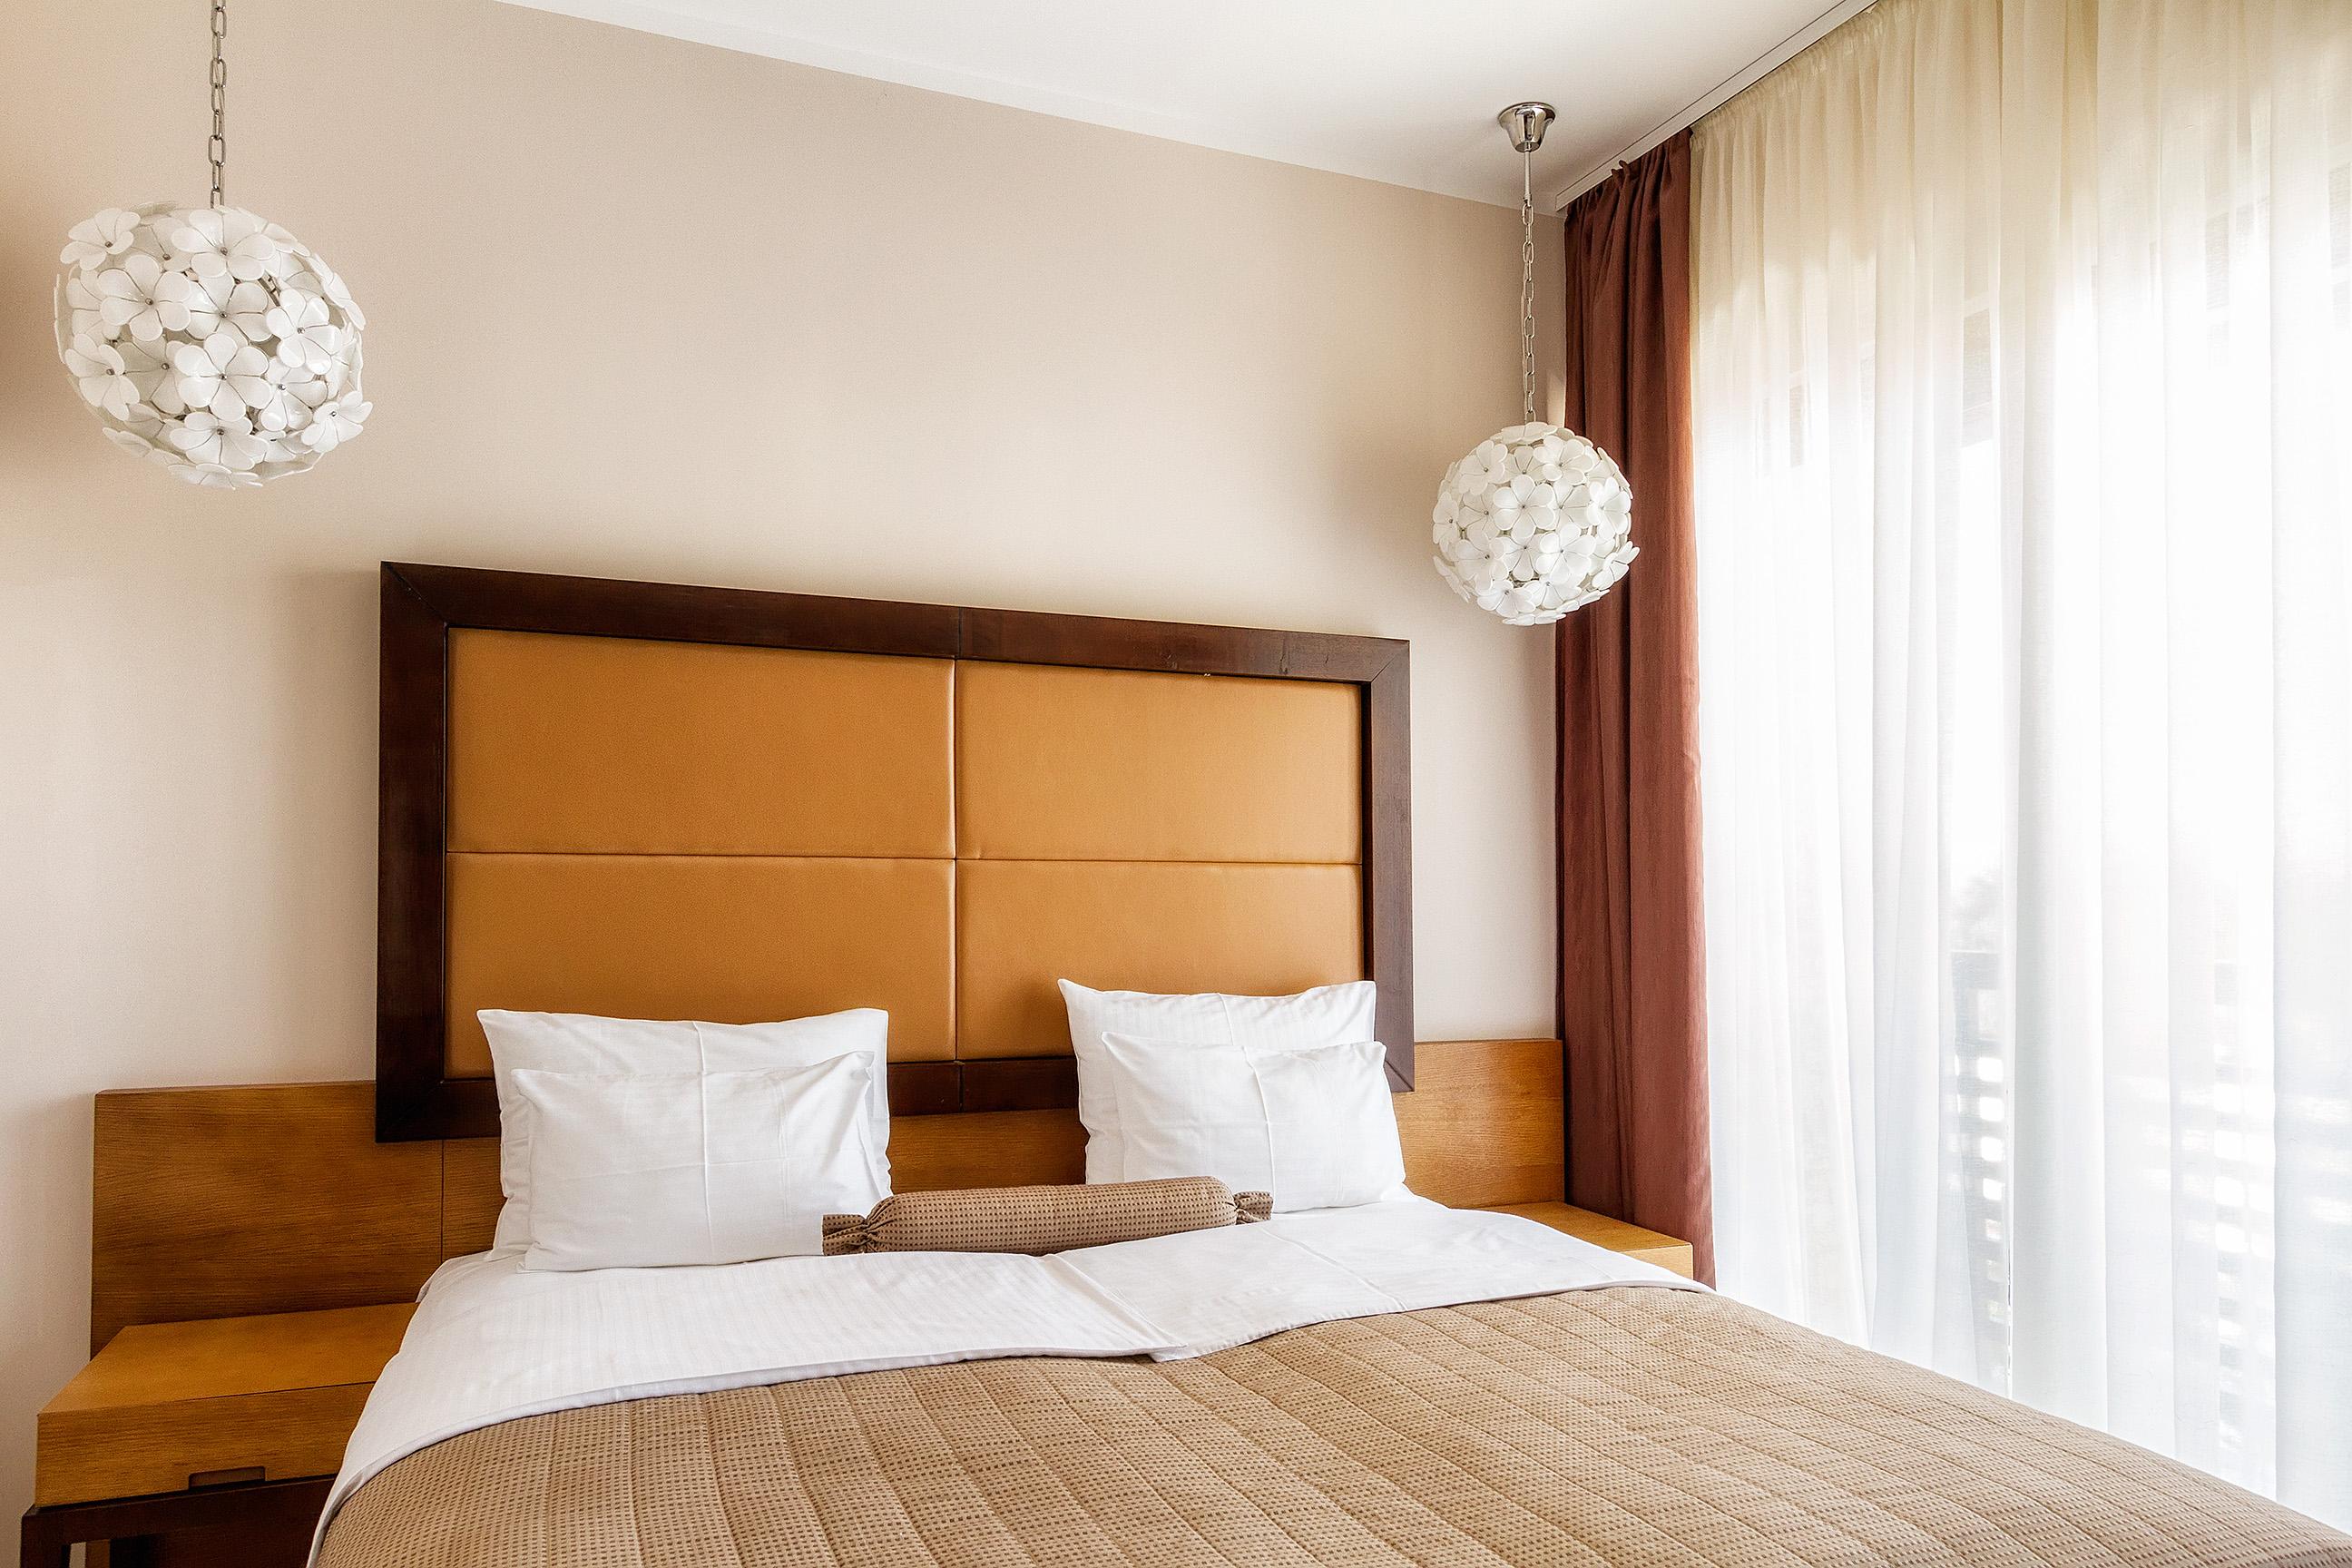 Zlatibor, smestaj, letnji odmor, spavanje, pansion, spa, soba, apartman, akcija, nova godina, hotel mir 14